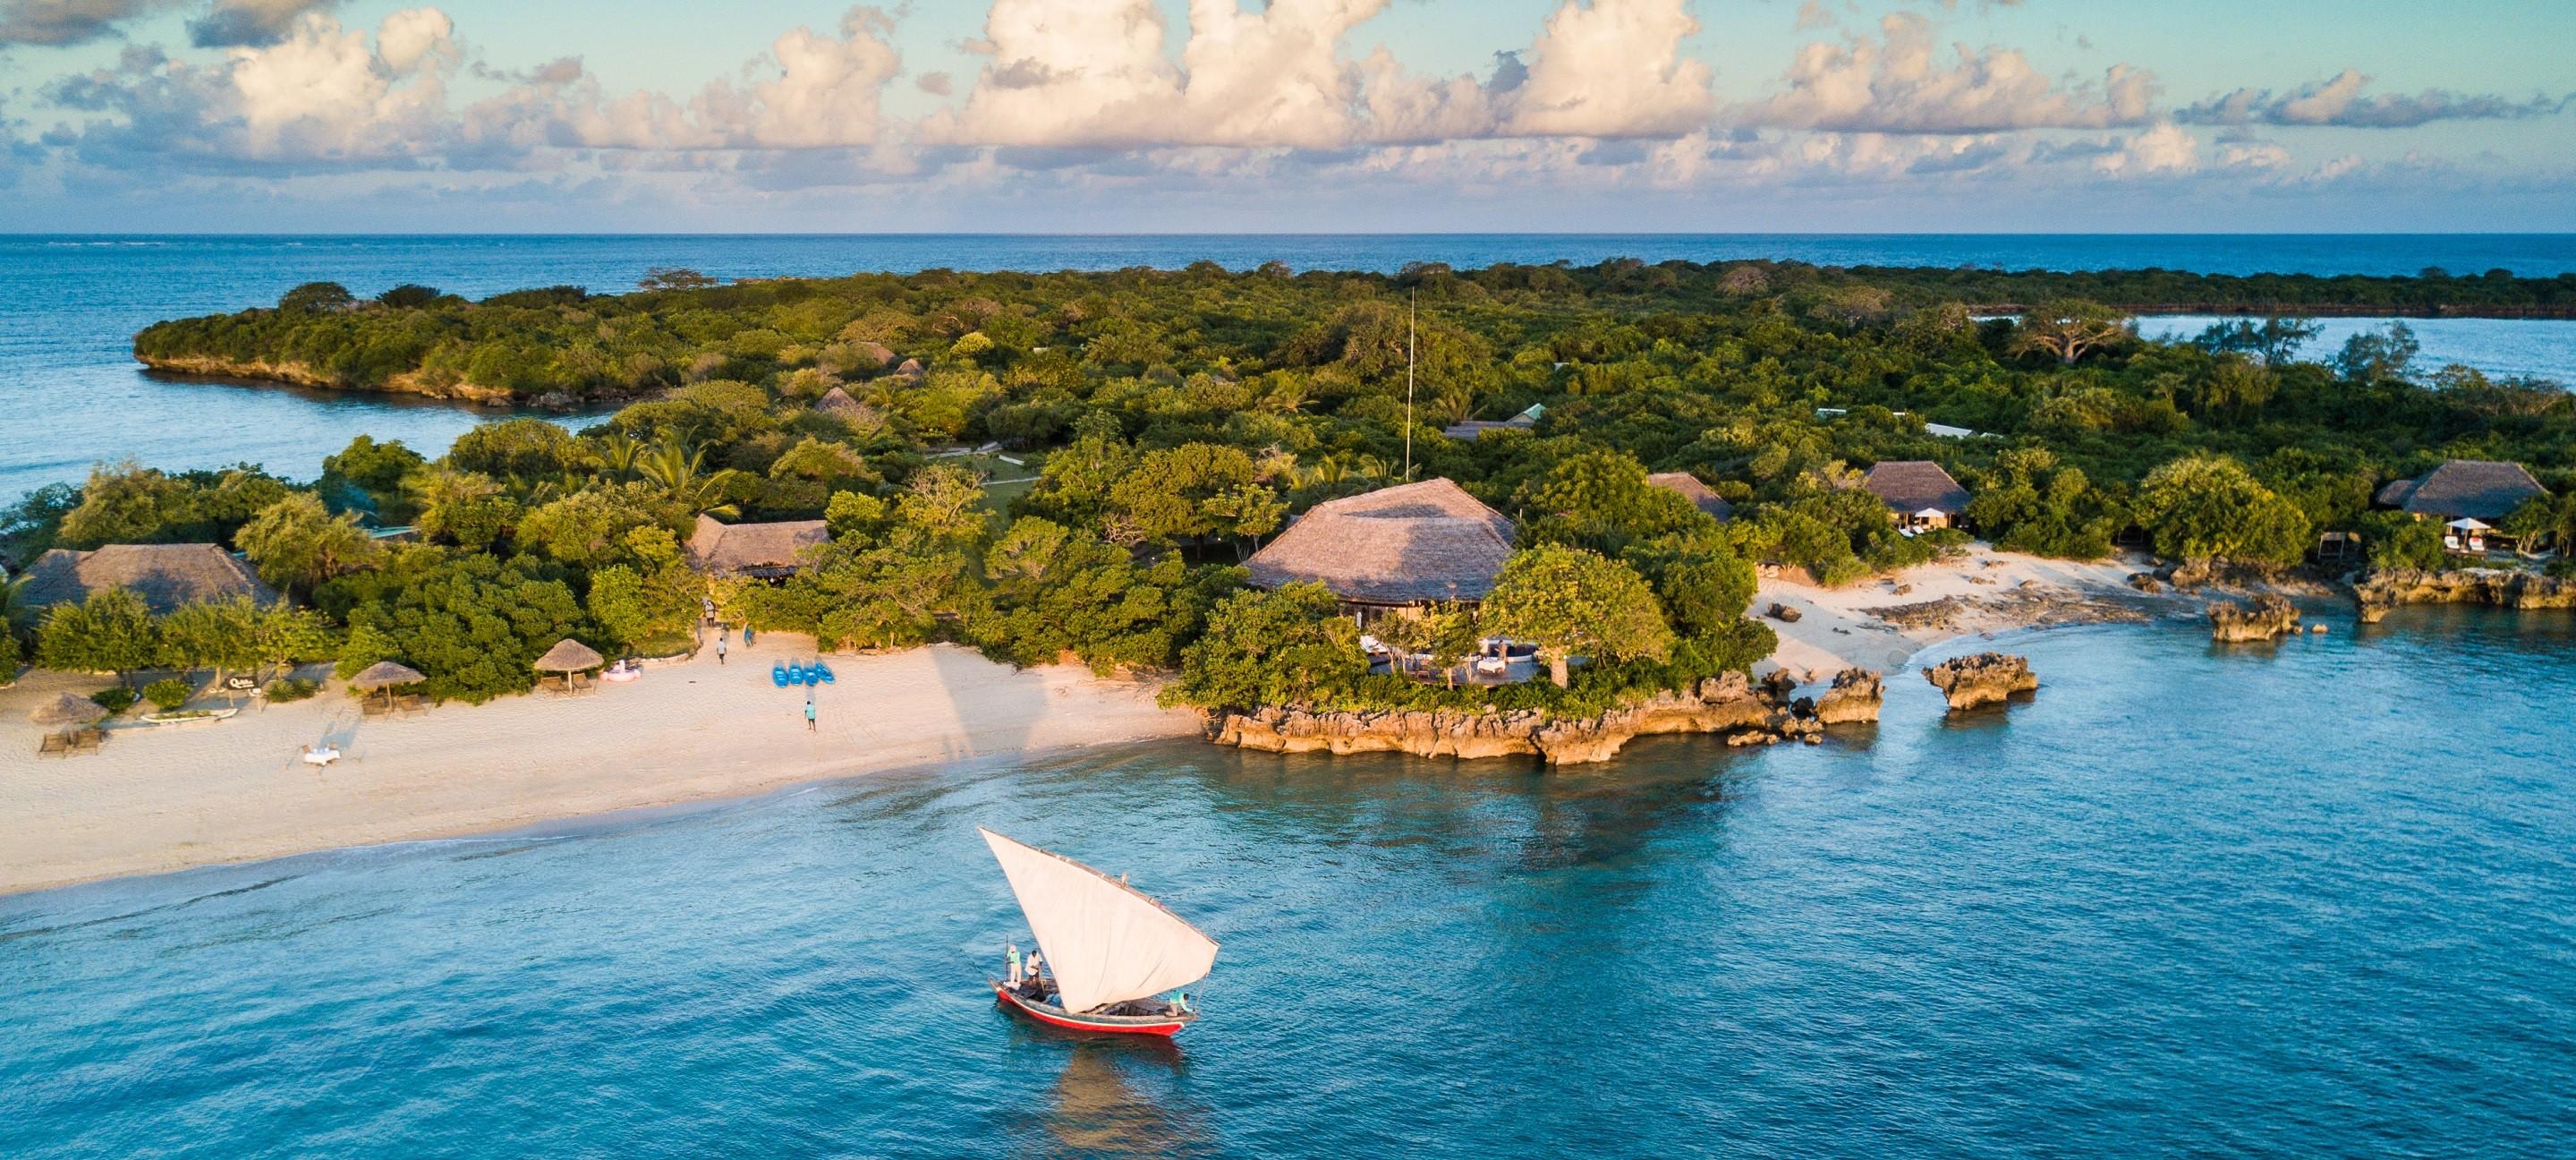 azura_quilalea_luxury_beach_hotel